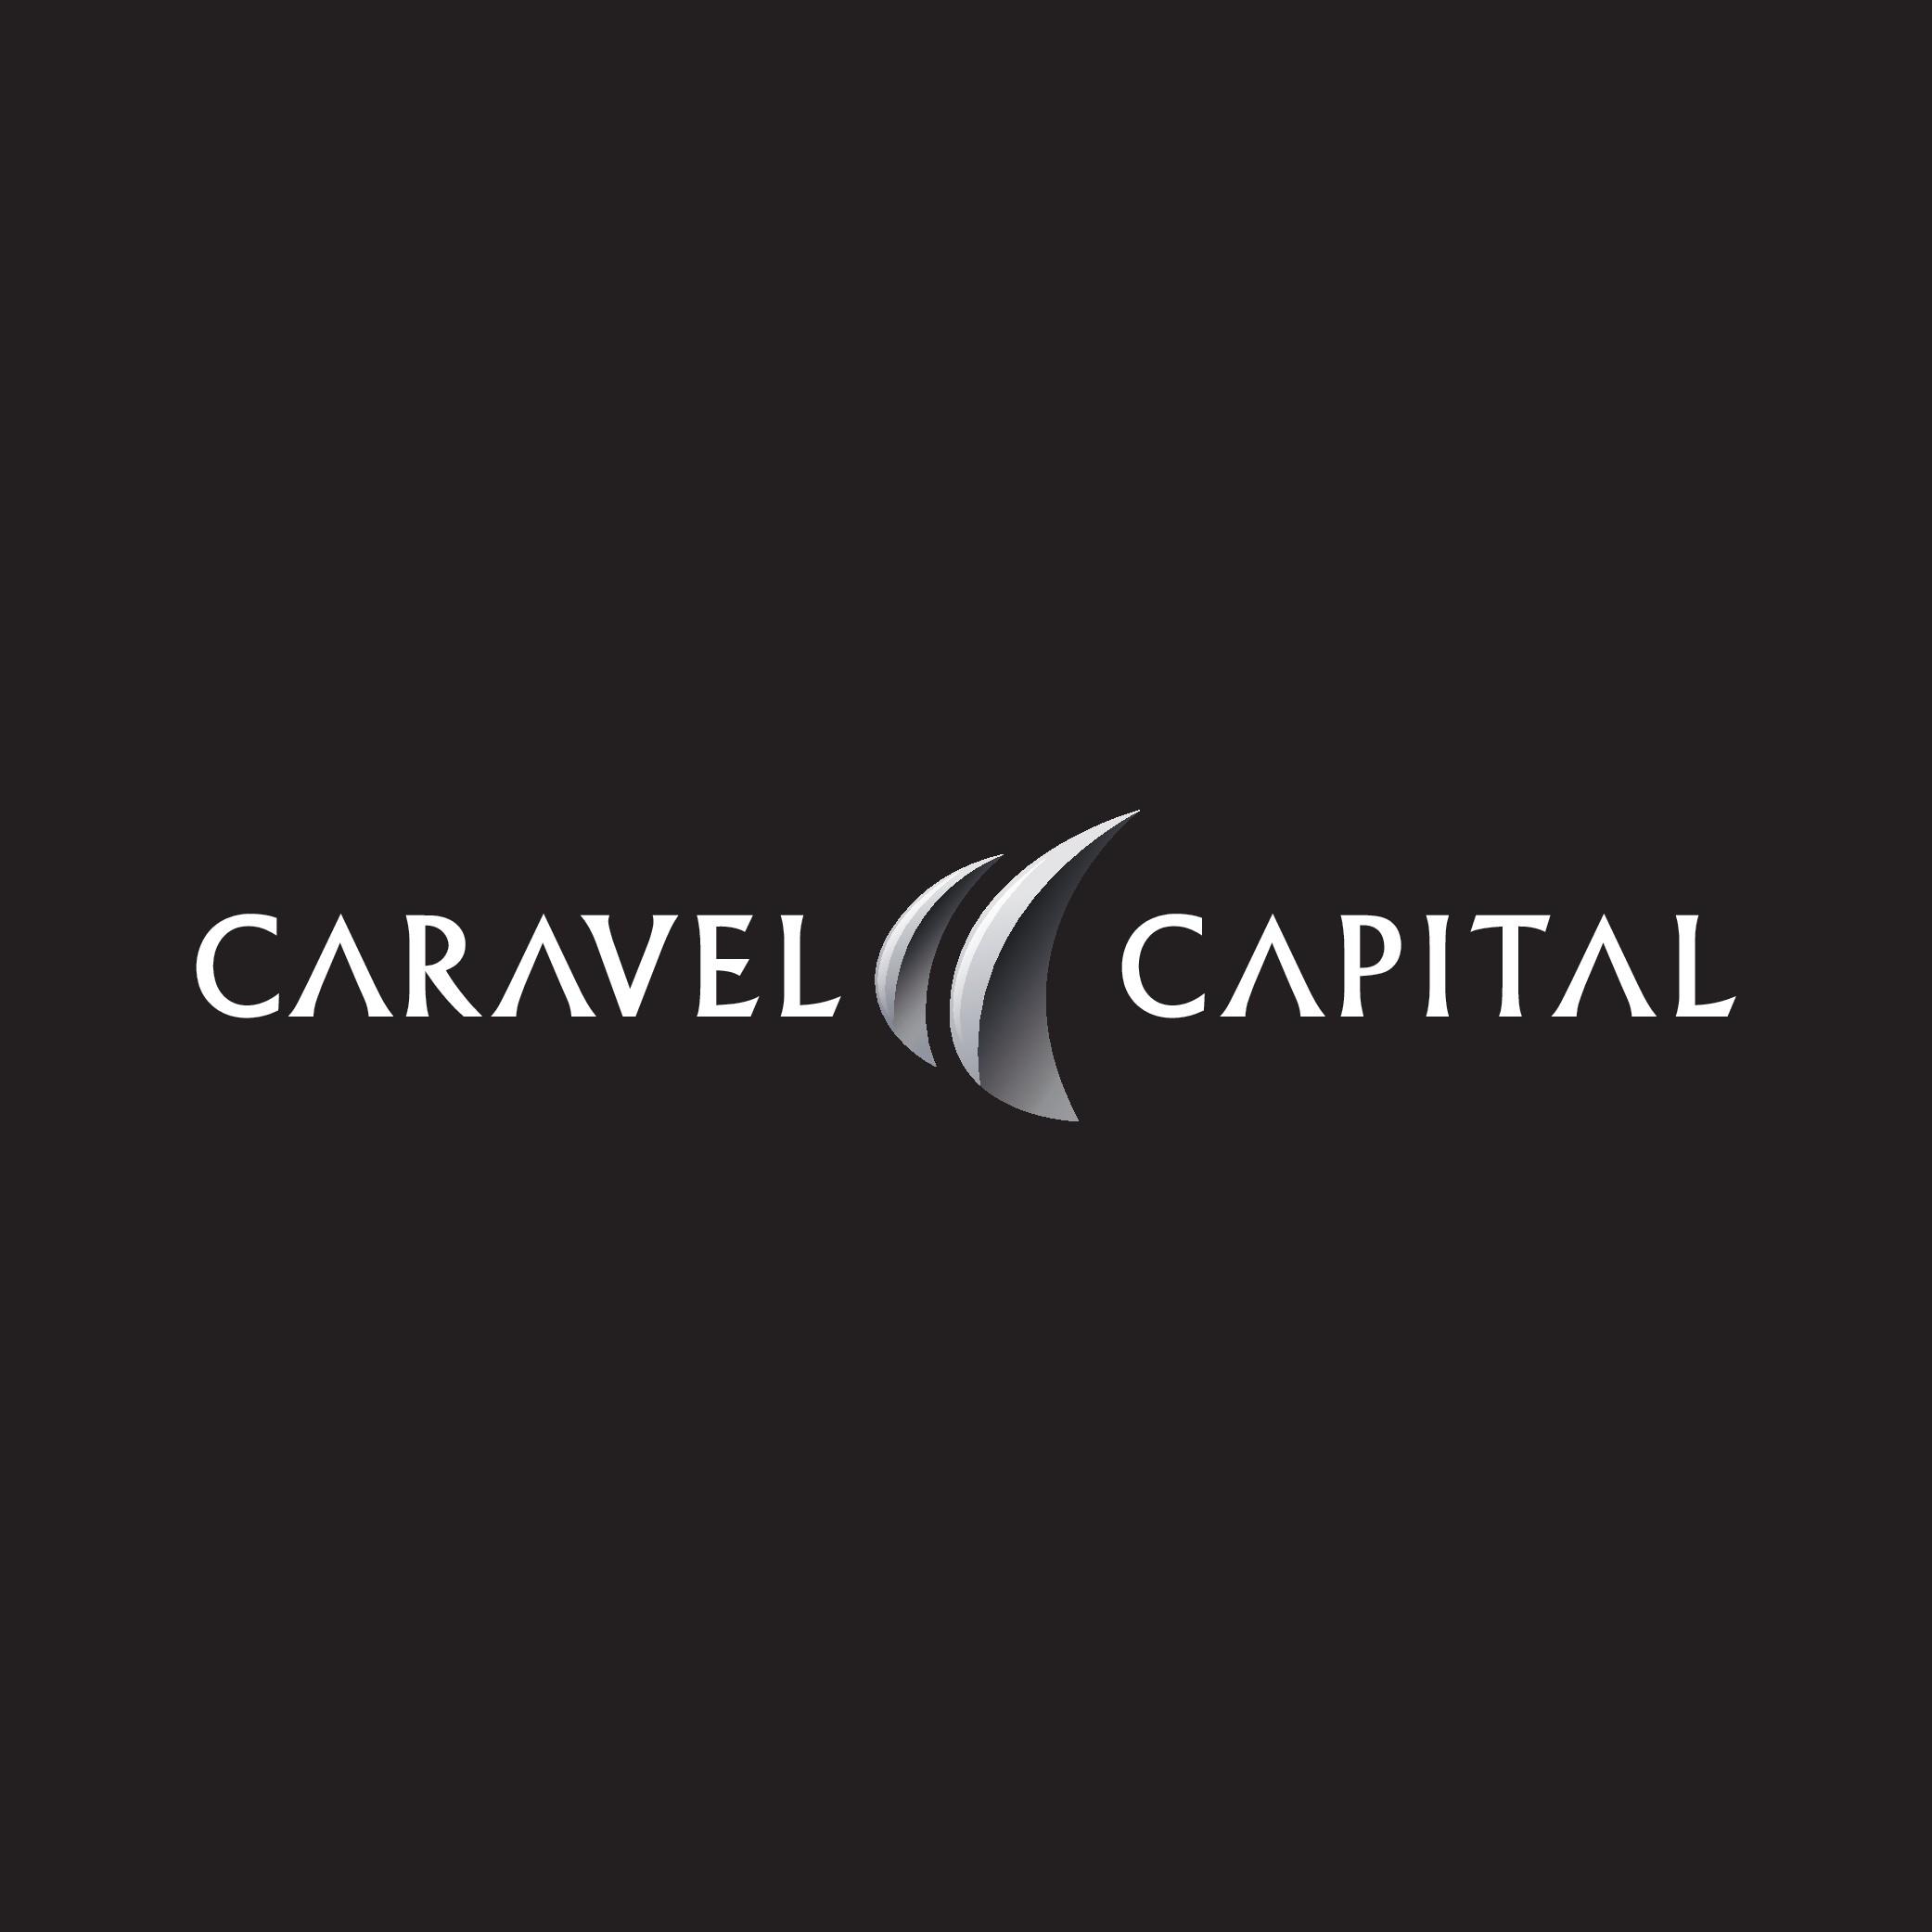 Design a logo to relay financial success depicting sails